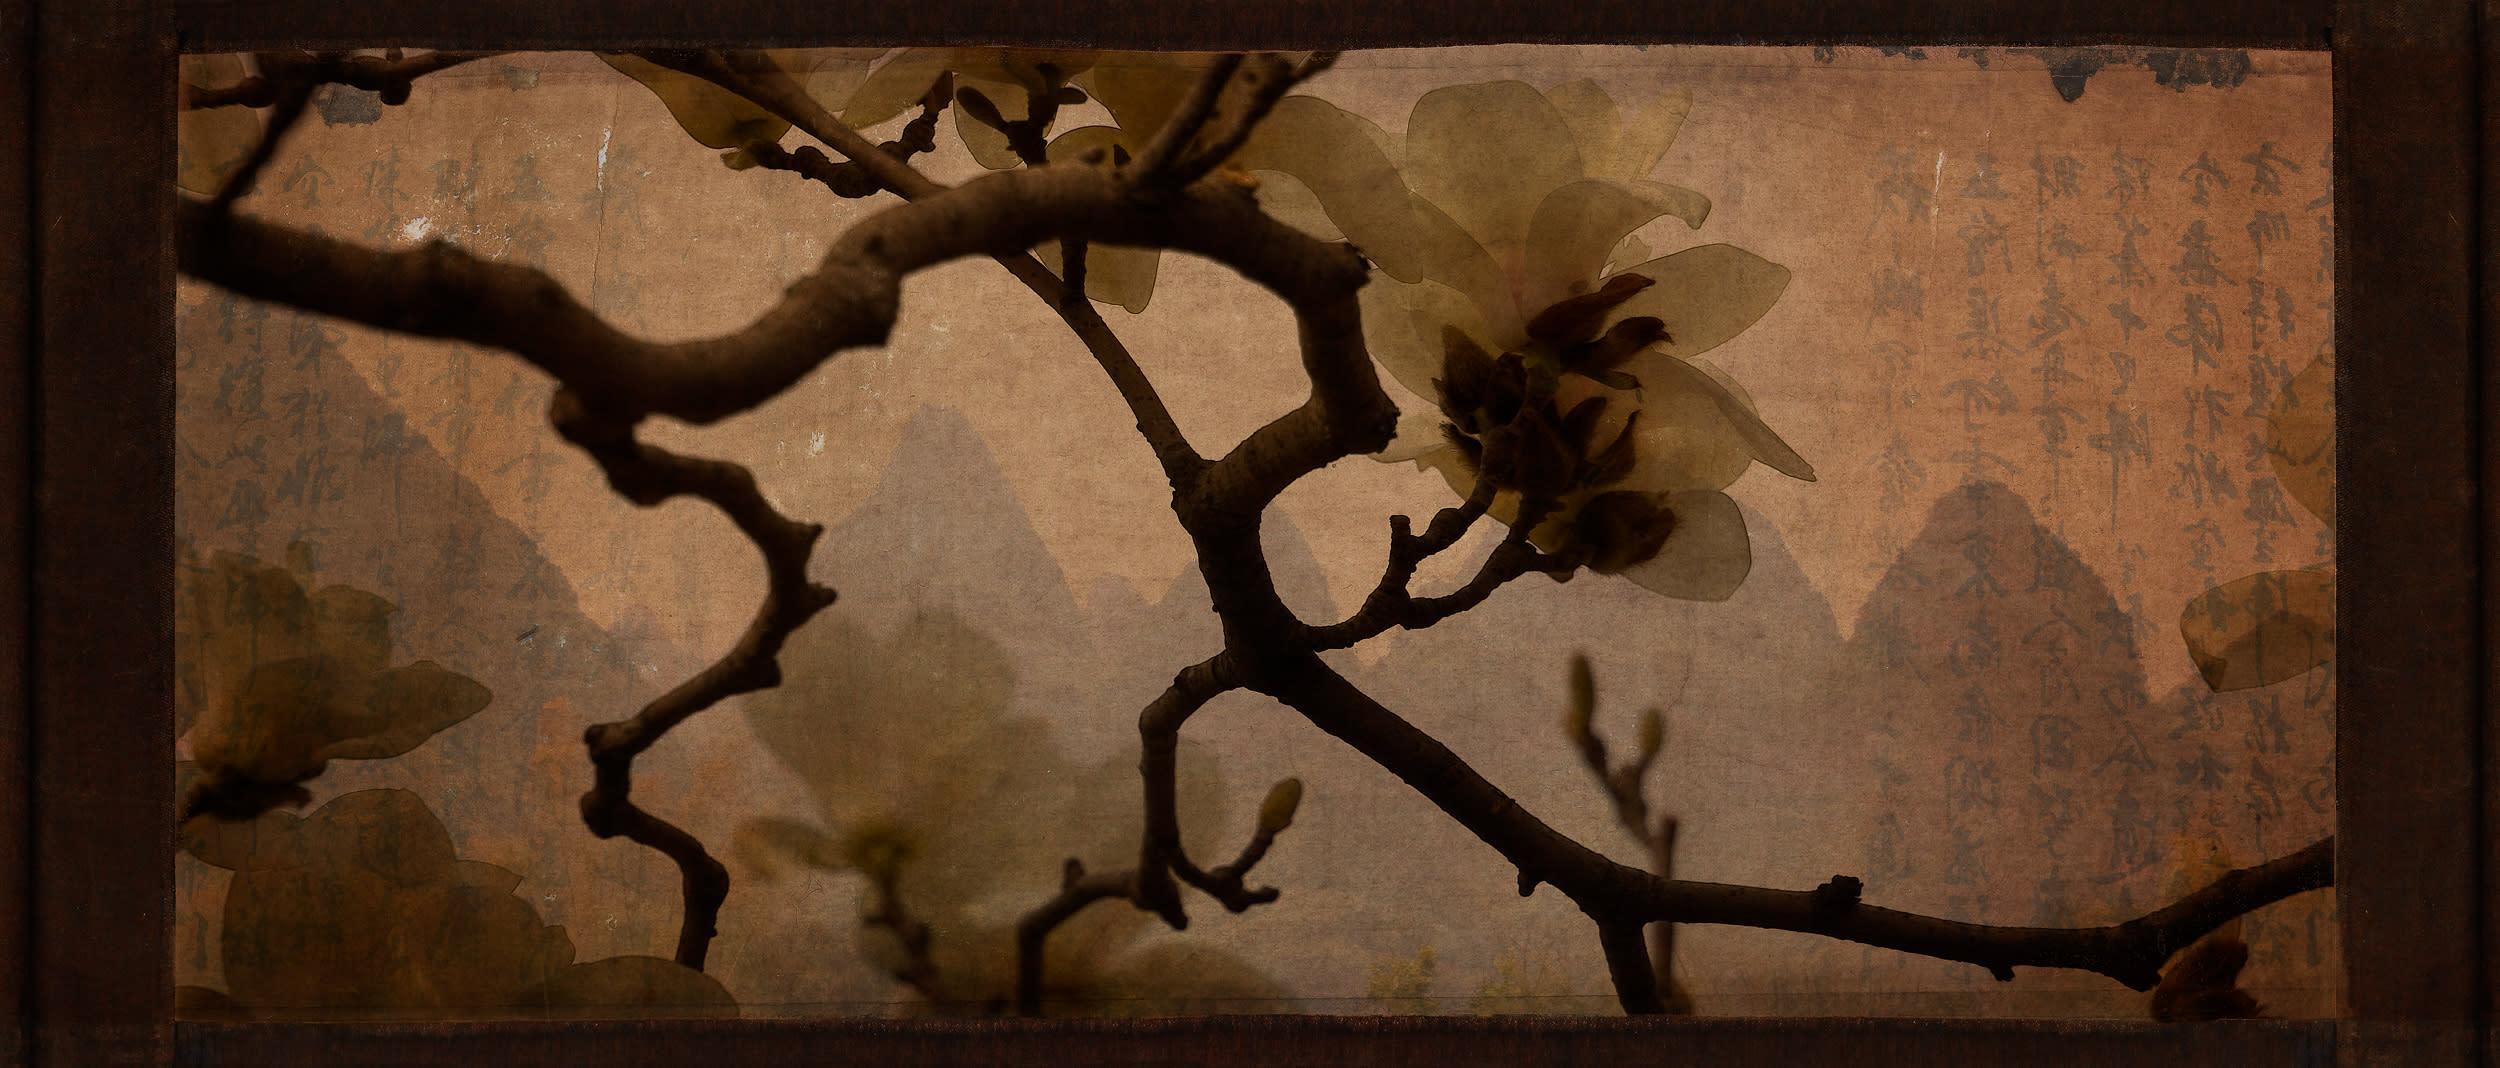 China magnolia blossoms 40x17 ivptpa